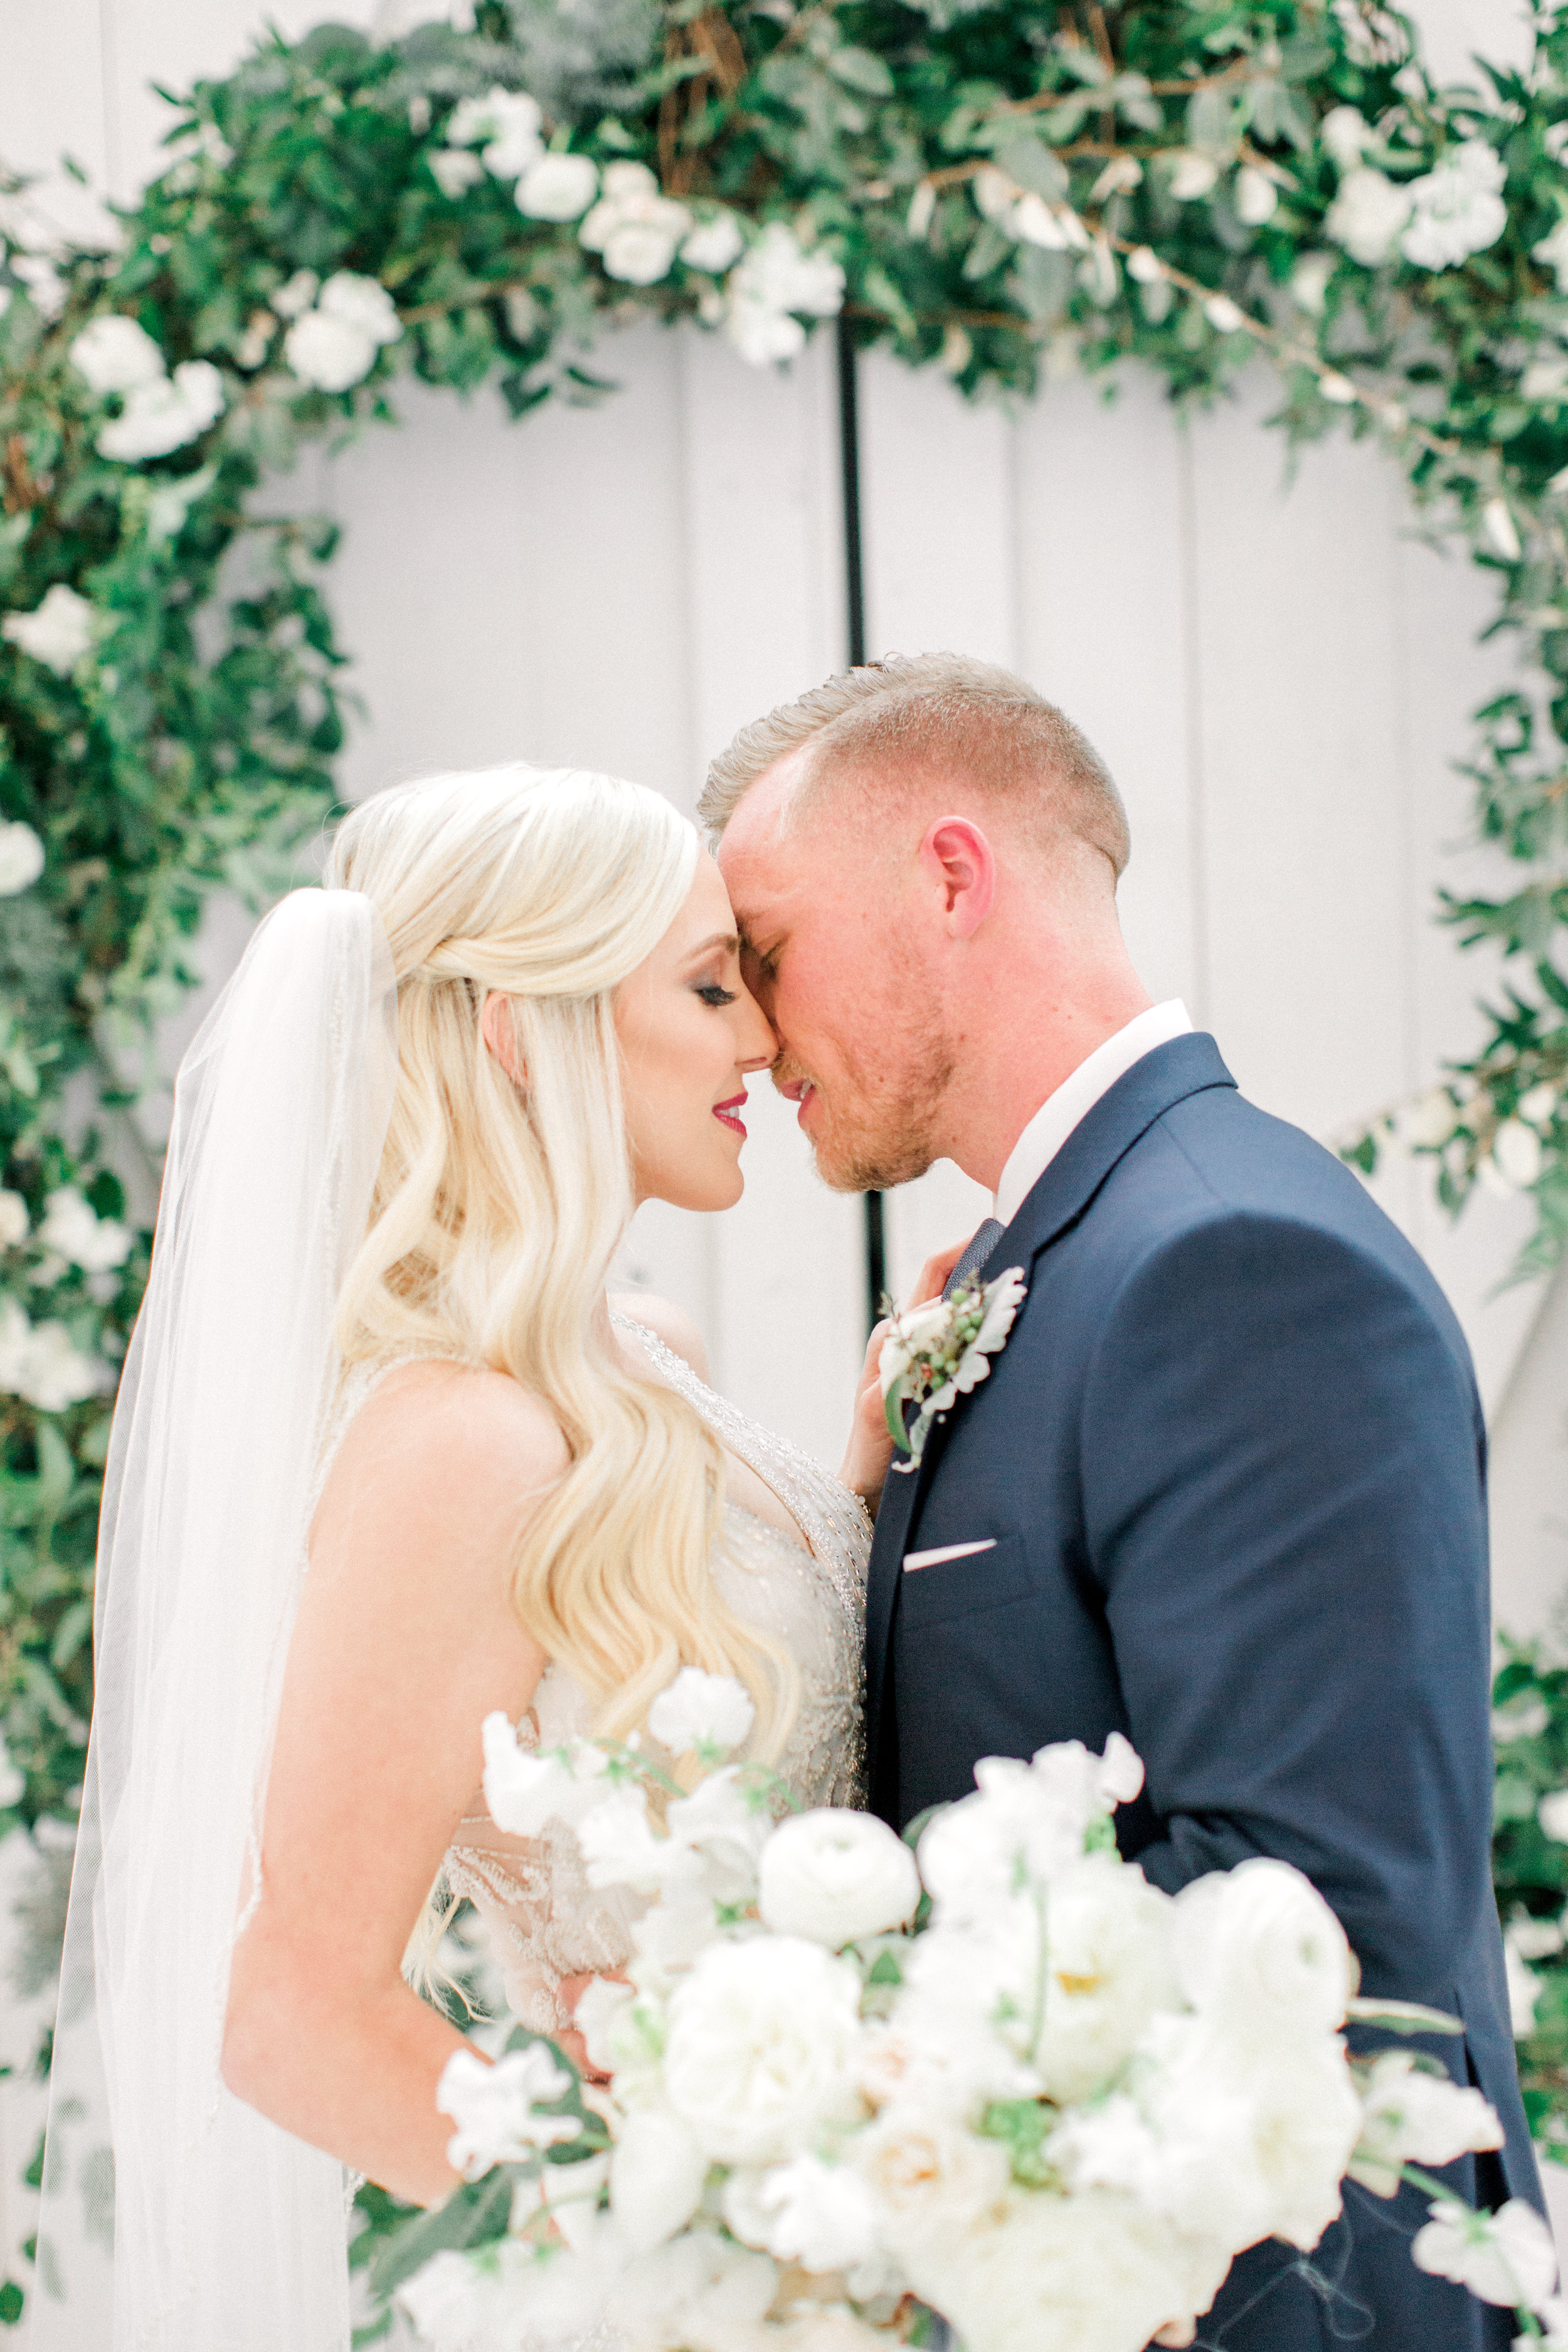 Chloe+Austin Wedding_642.JPG